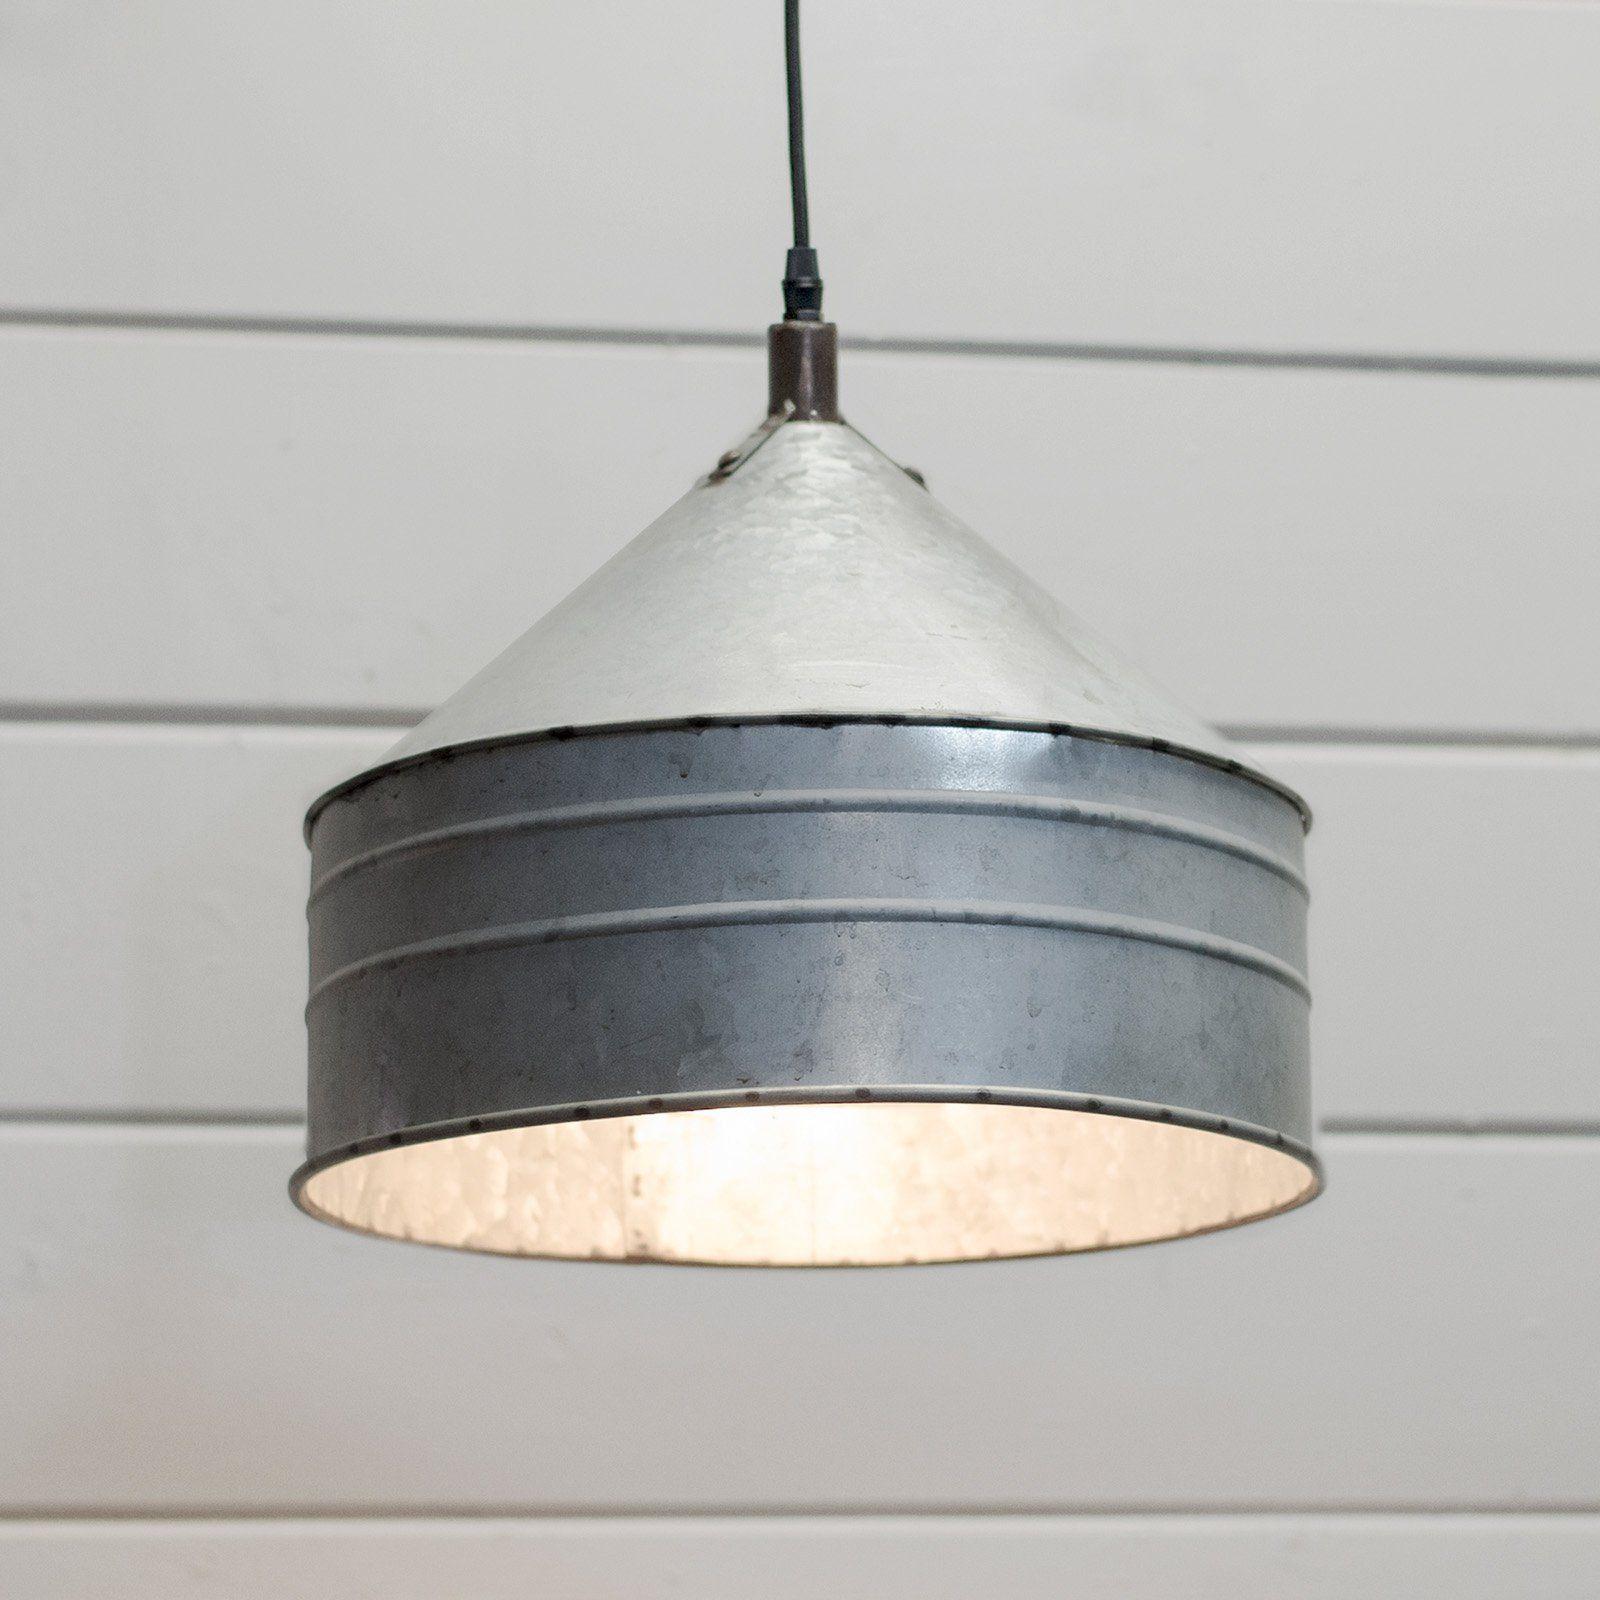 American mercantile ih1111 metal shade pendant light